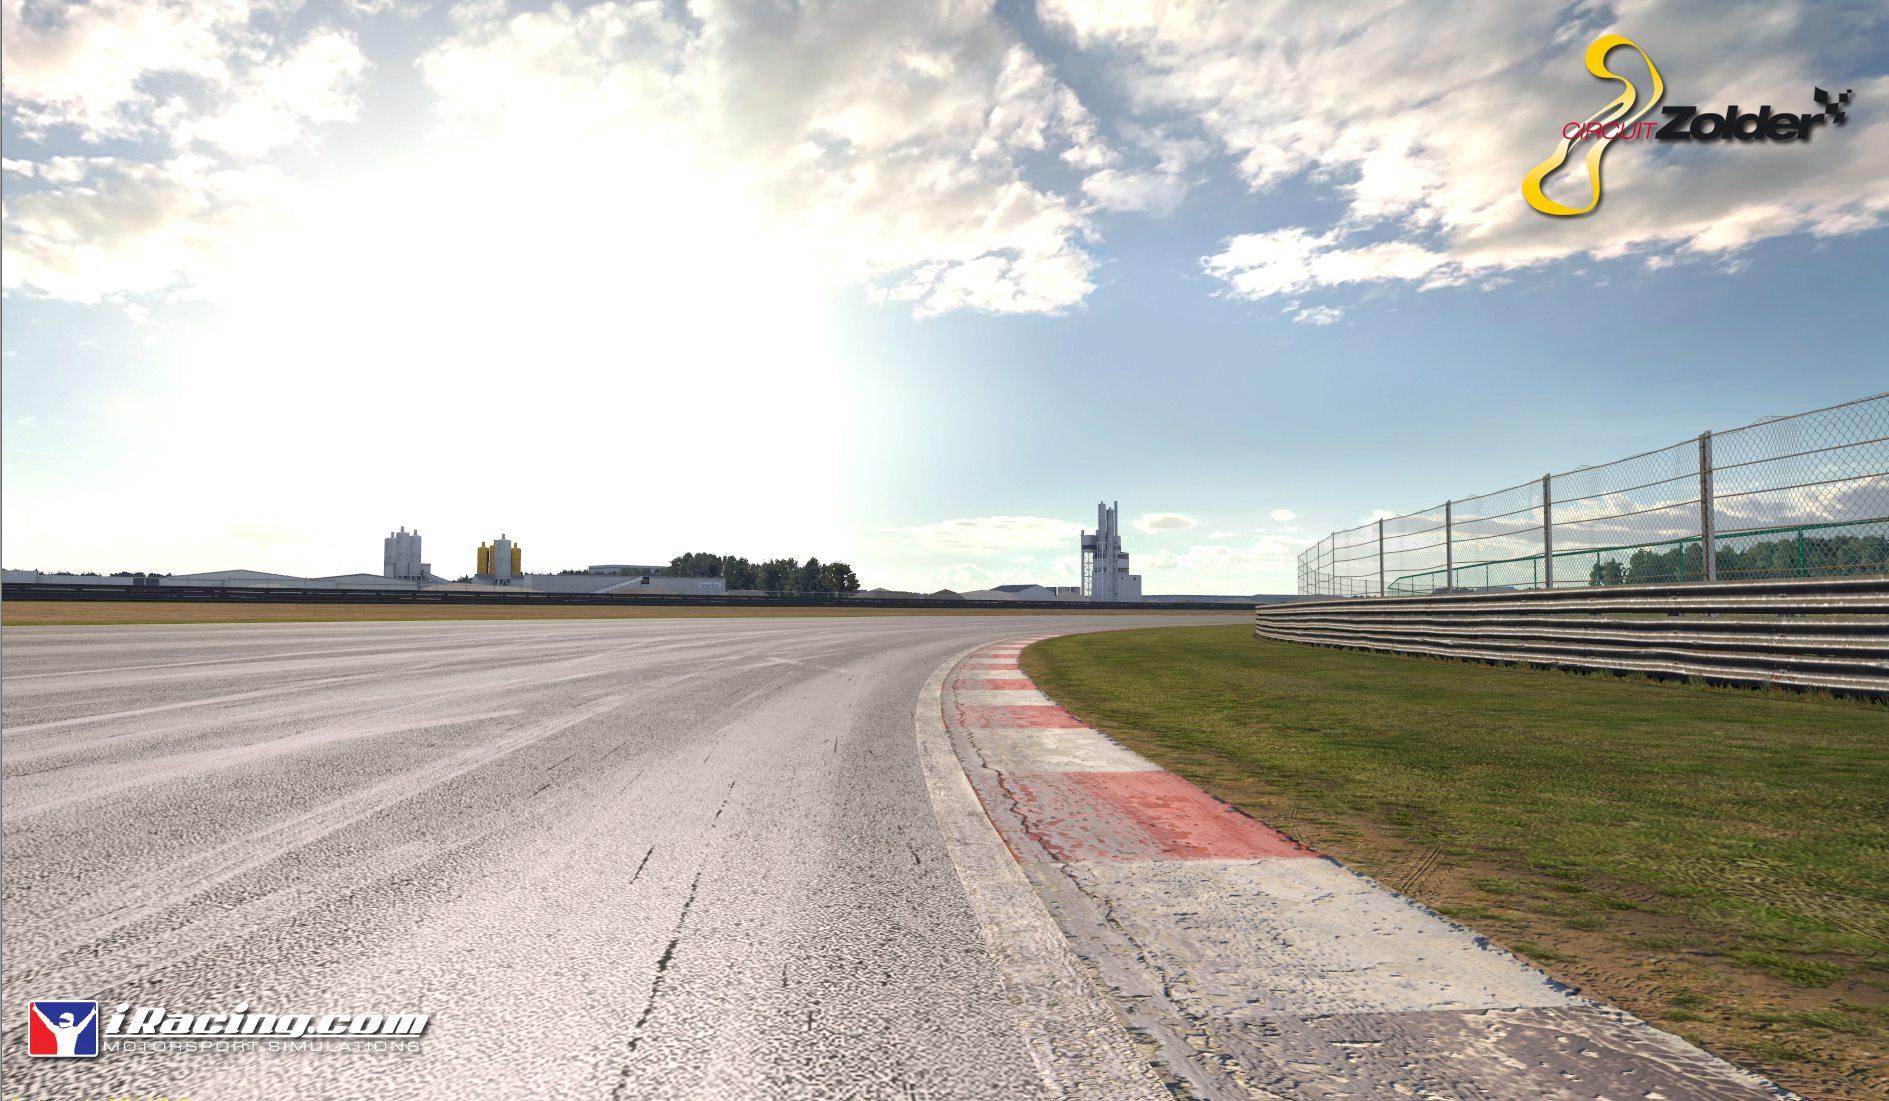 Circuito Zolder Belgica : Bsimracing